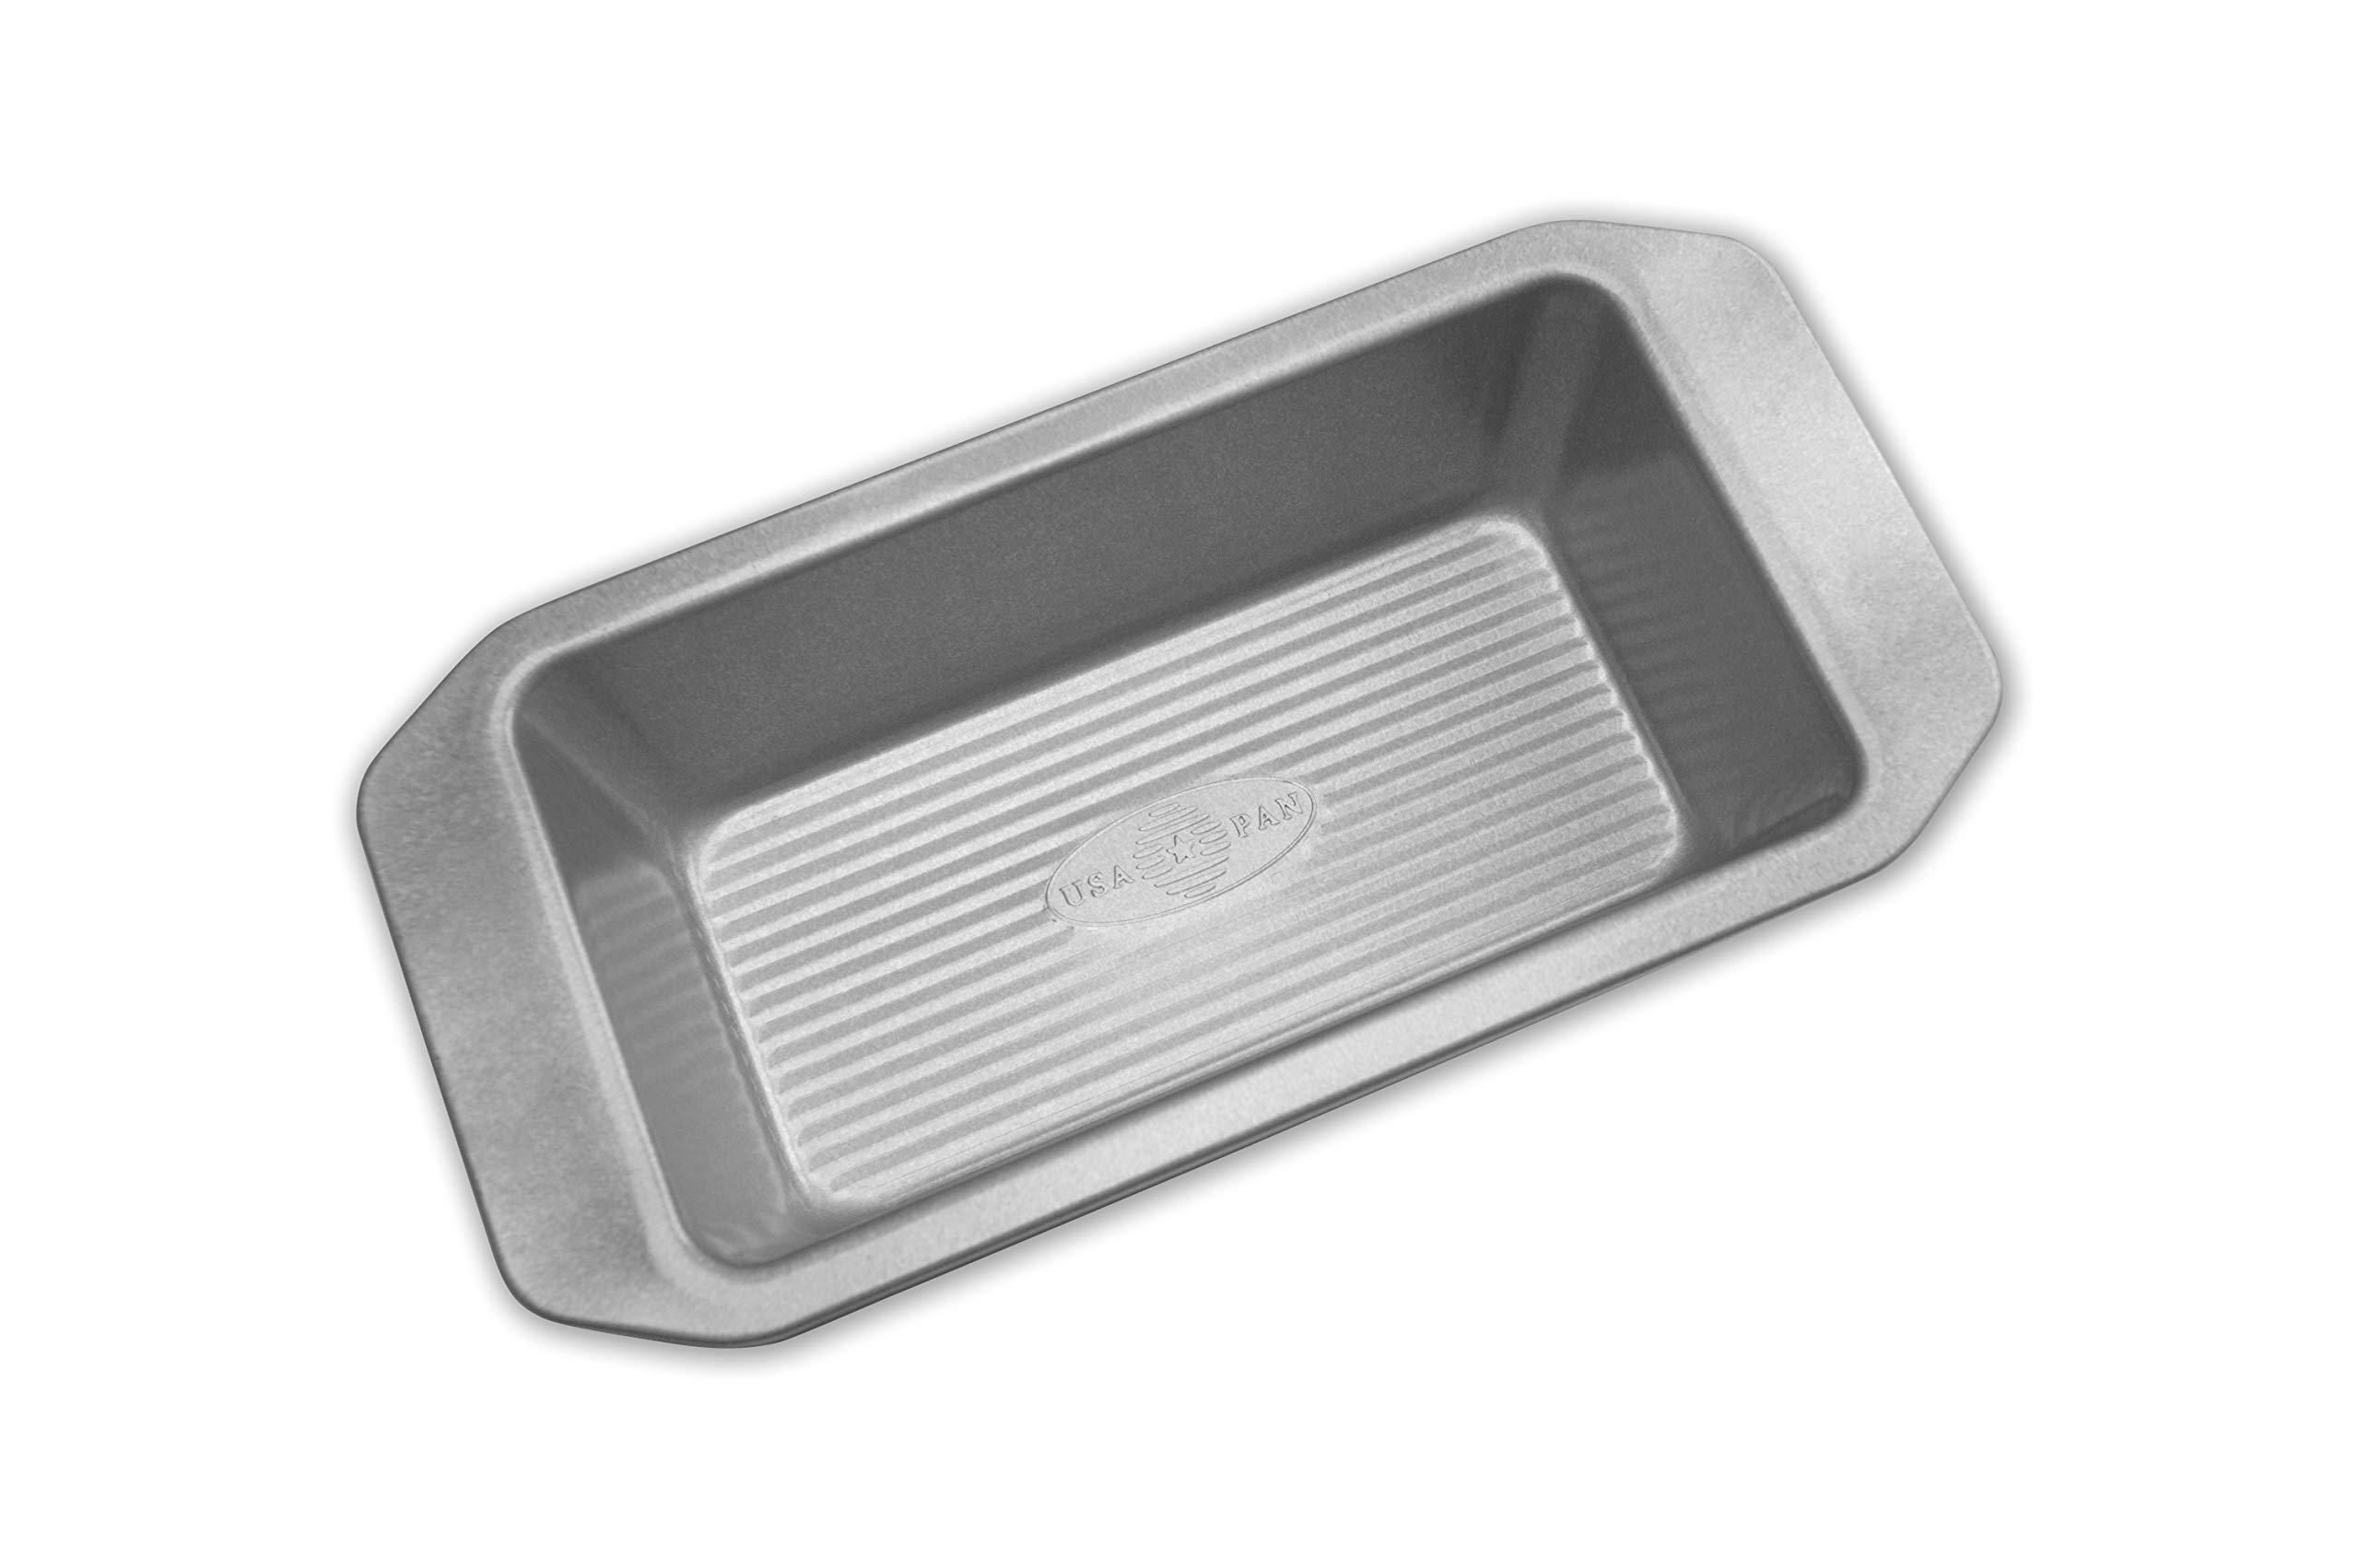 USA Pan 1140LF-3-ABC American Bakeware Classics 1-Pound Loaf Pan, Aluminized Steel by USA Pan